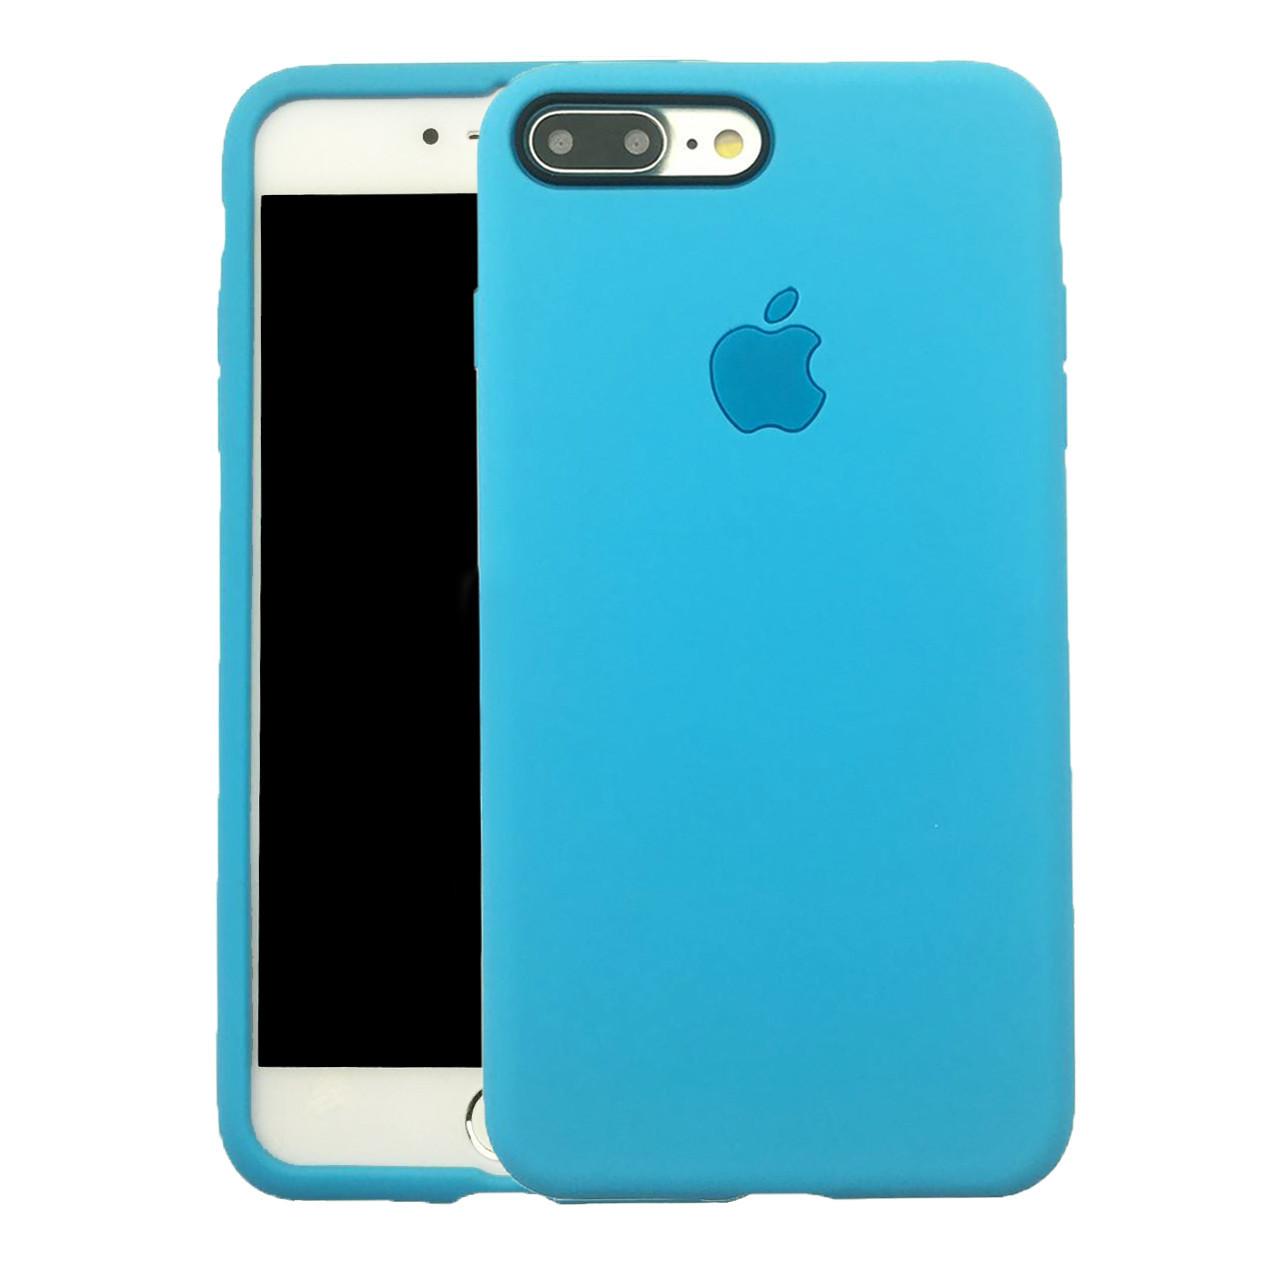 Чехол для iPhone 7 Plus/8Plus Soft case голубой